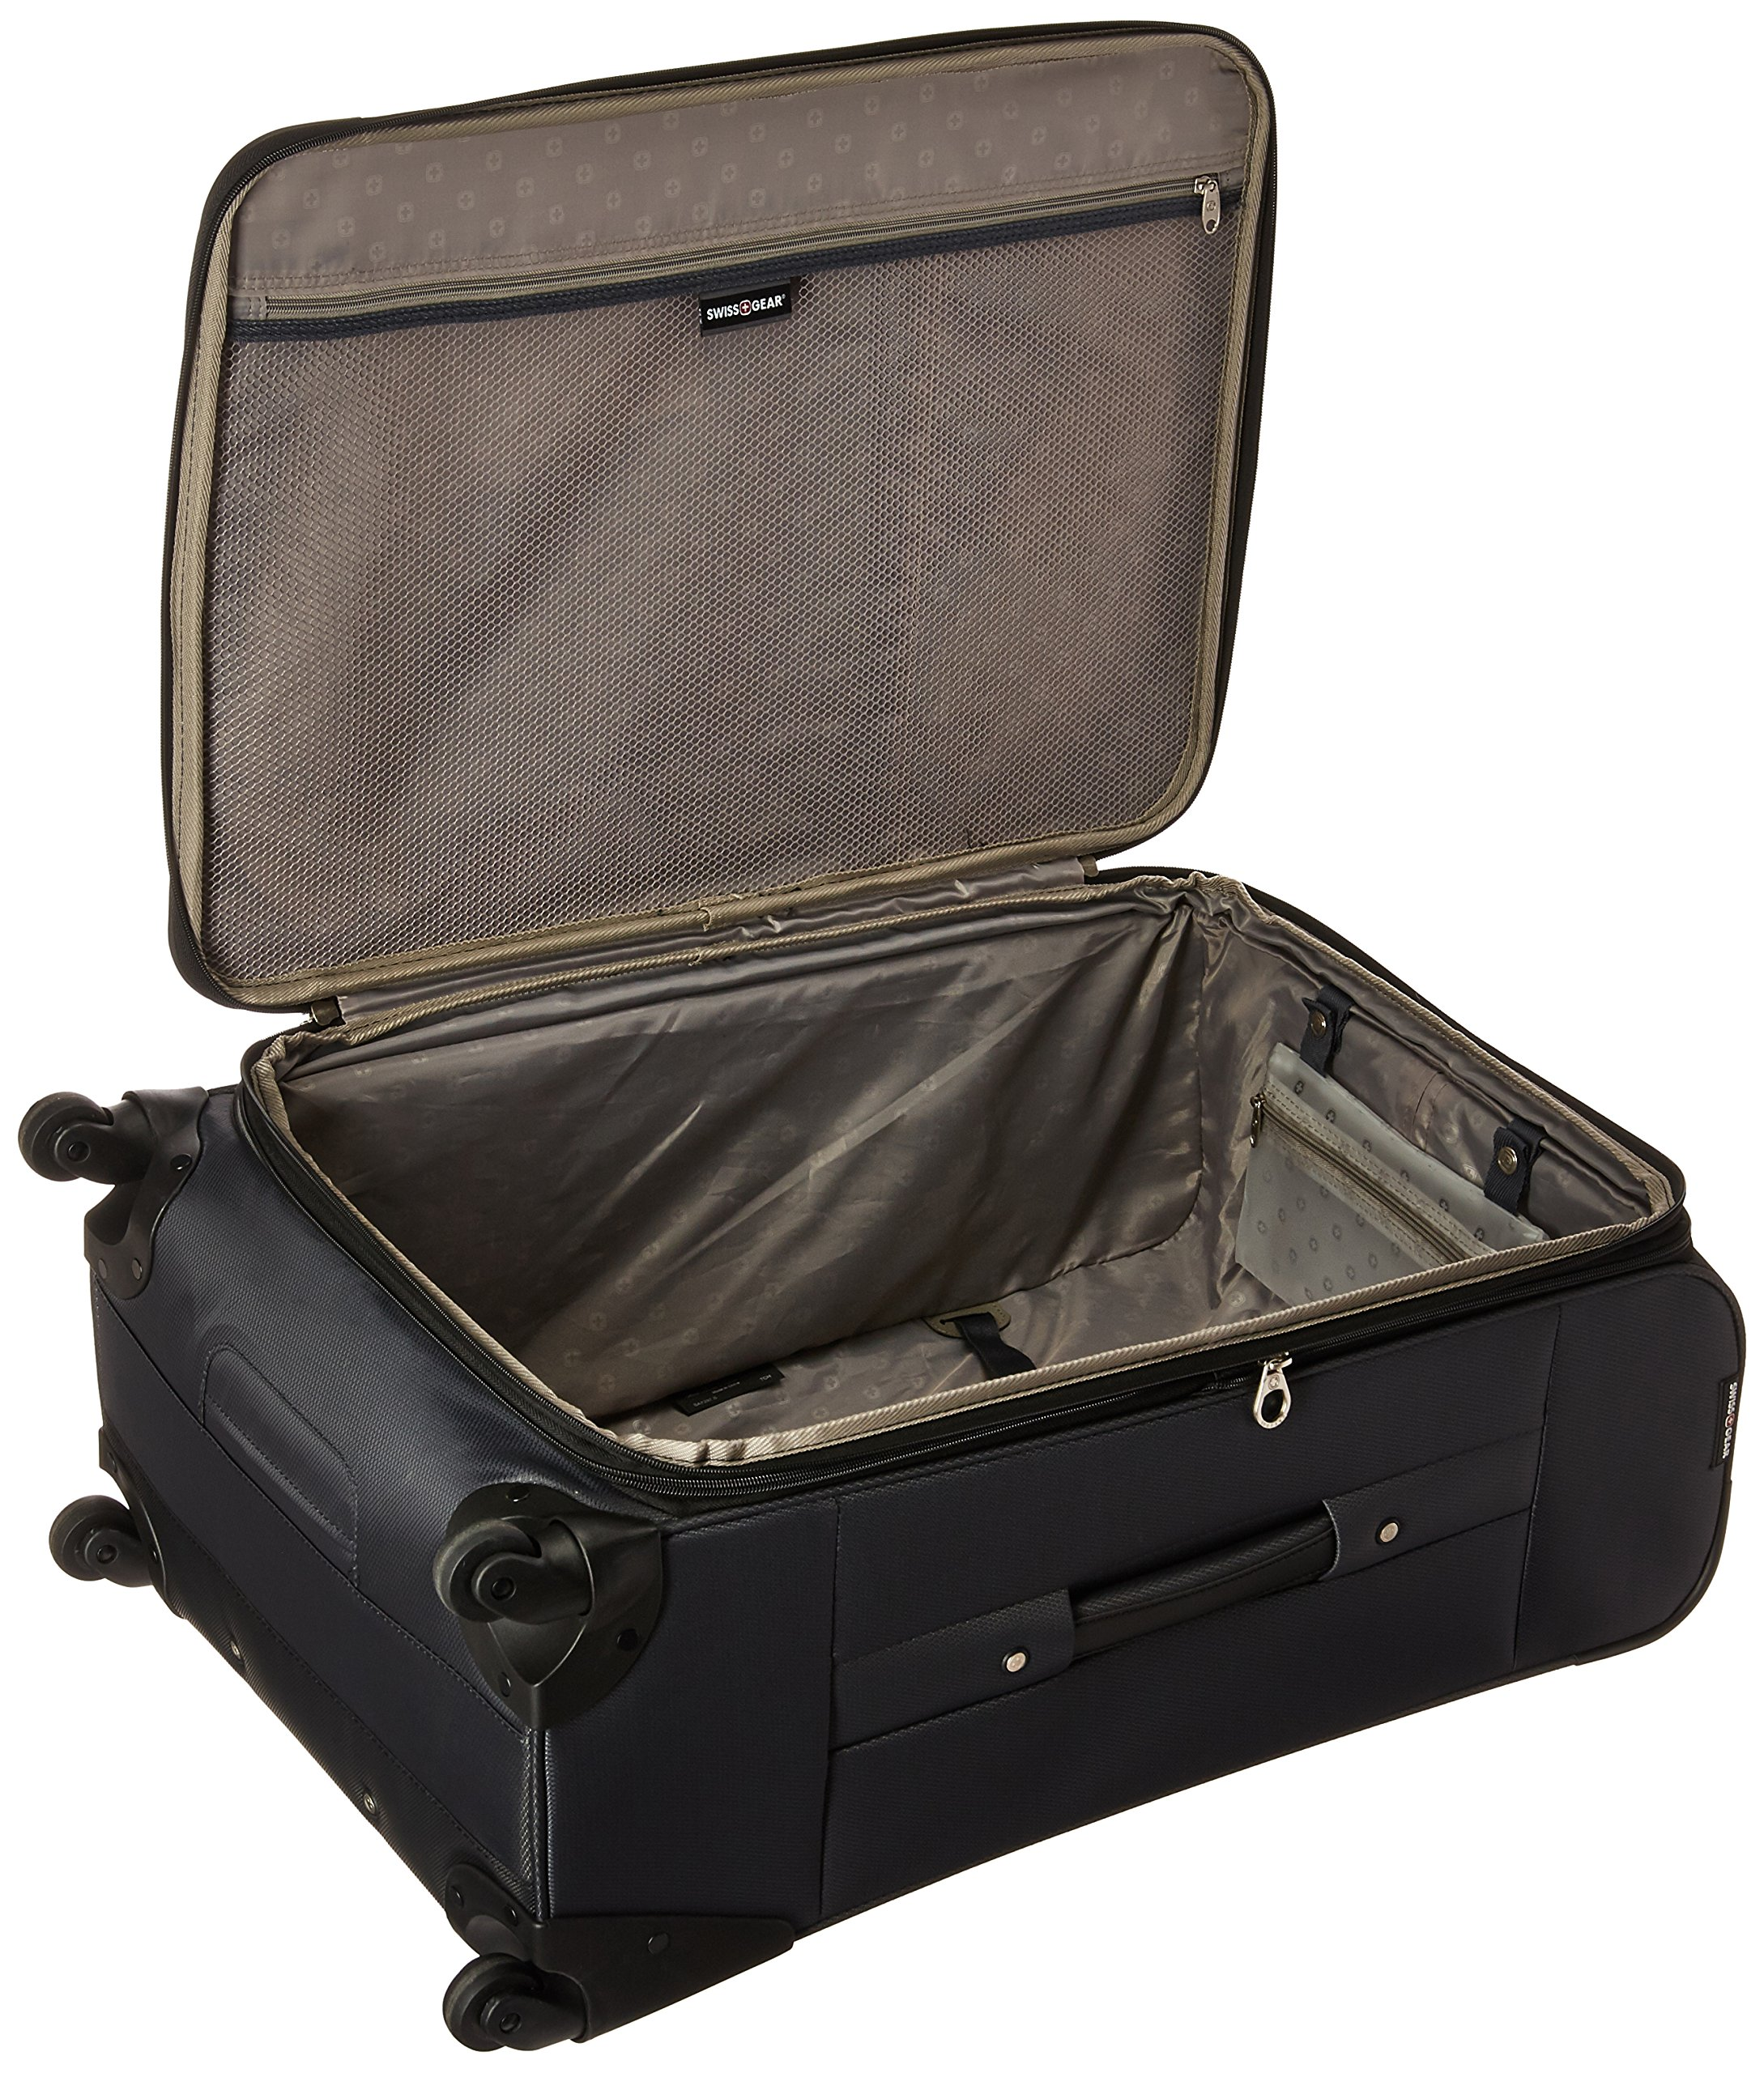 SwissGear Maggiore 28'' Suitcase, Grey by SwissGear (Image #5)